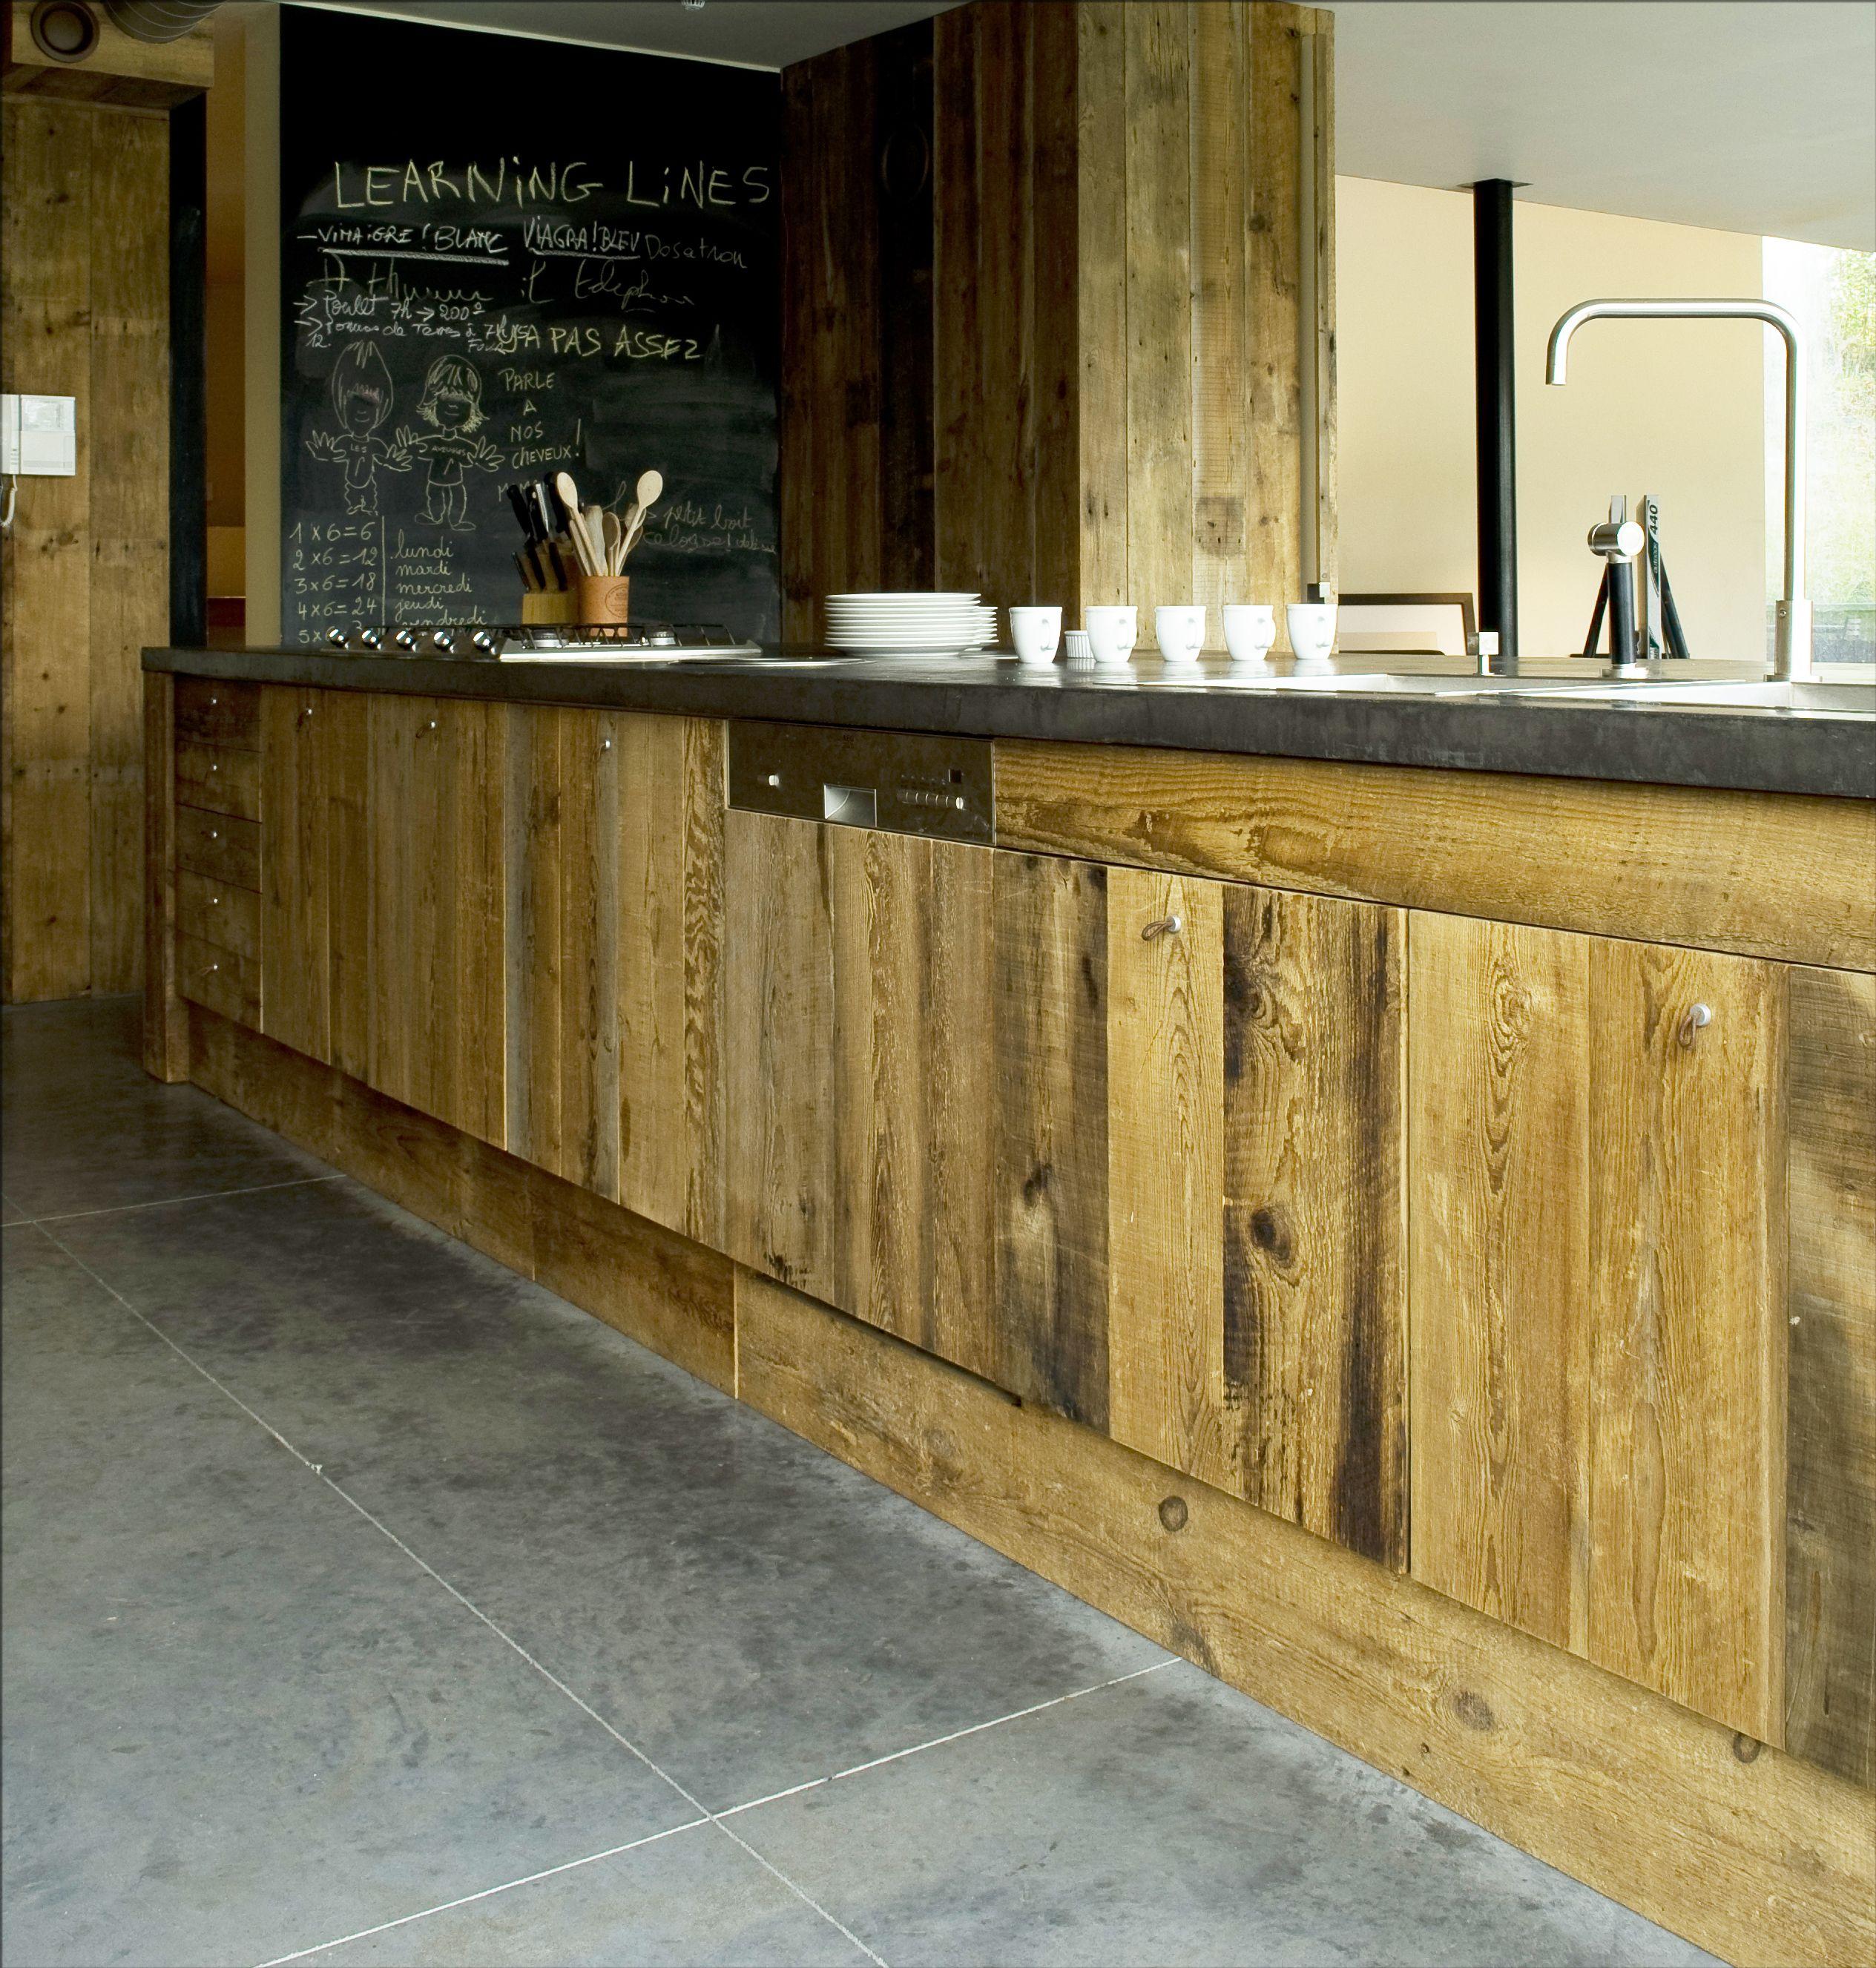 fa ade cuisine bois recycl palettes pinterest facade cuisine bois recycl et fa ades. Black Bedroom Furniture Sets. Home Design Ideas